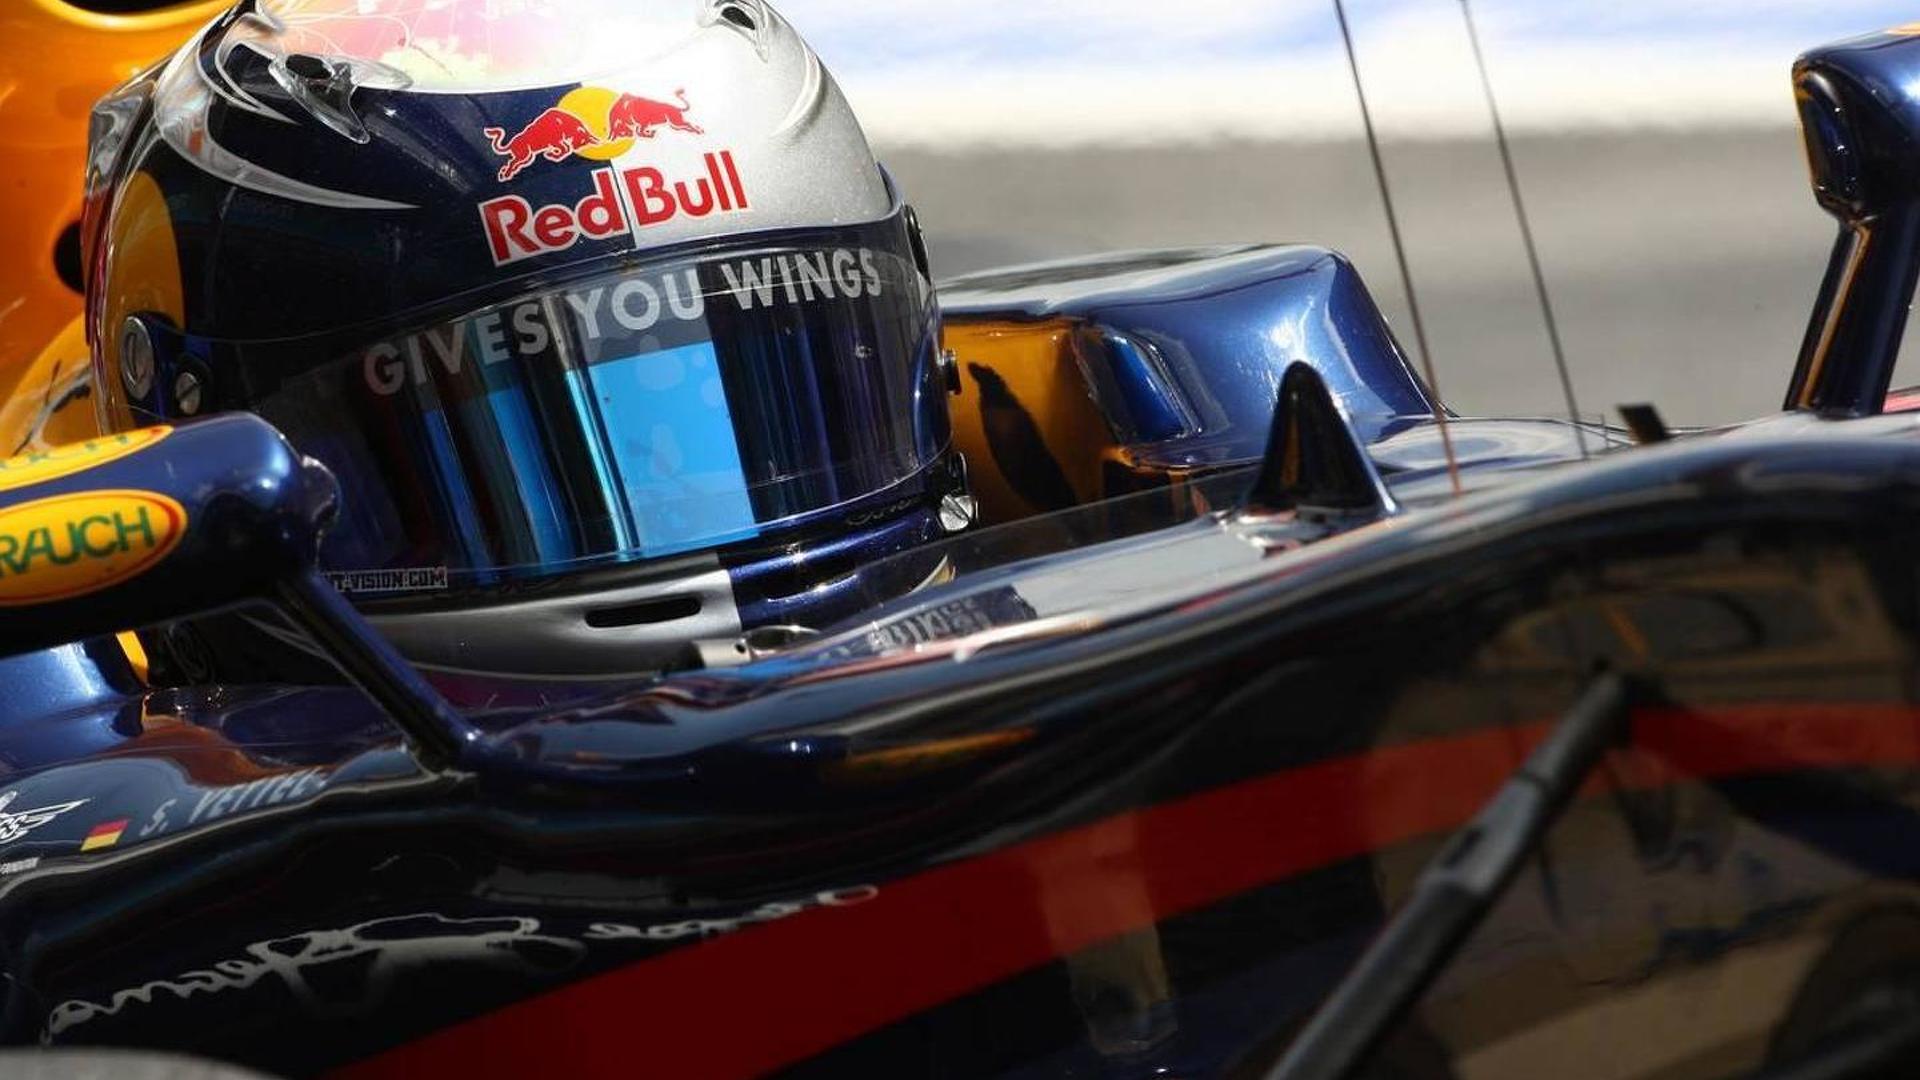 Red Bull's pace 'frightening' - Schumacher